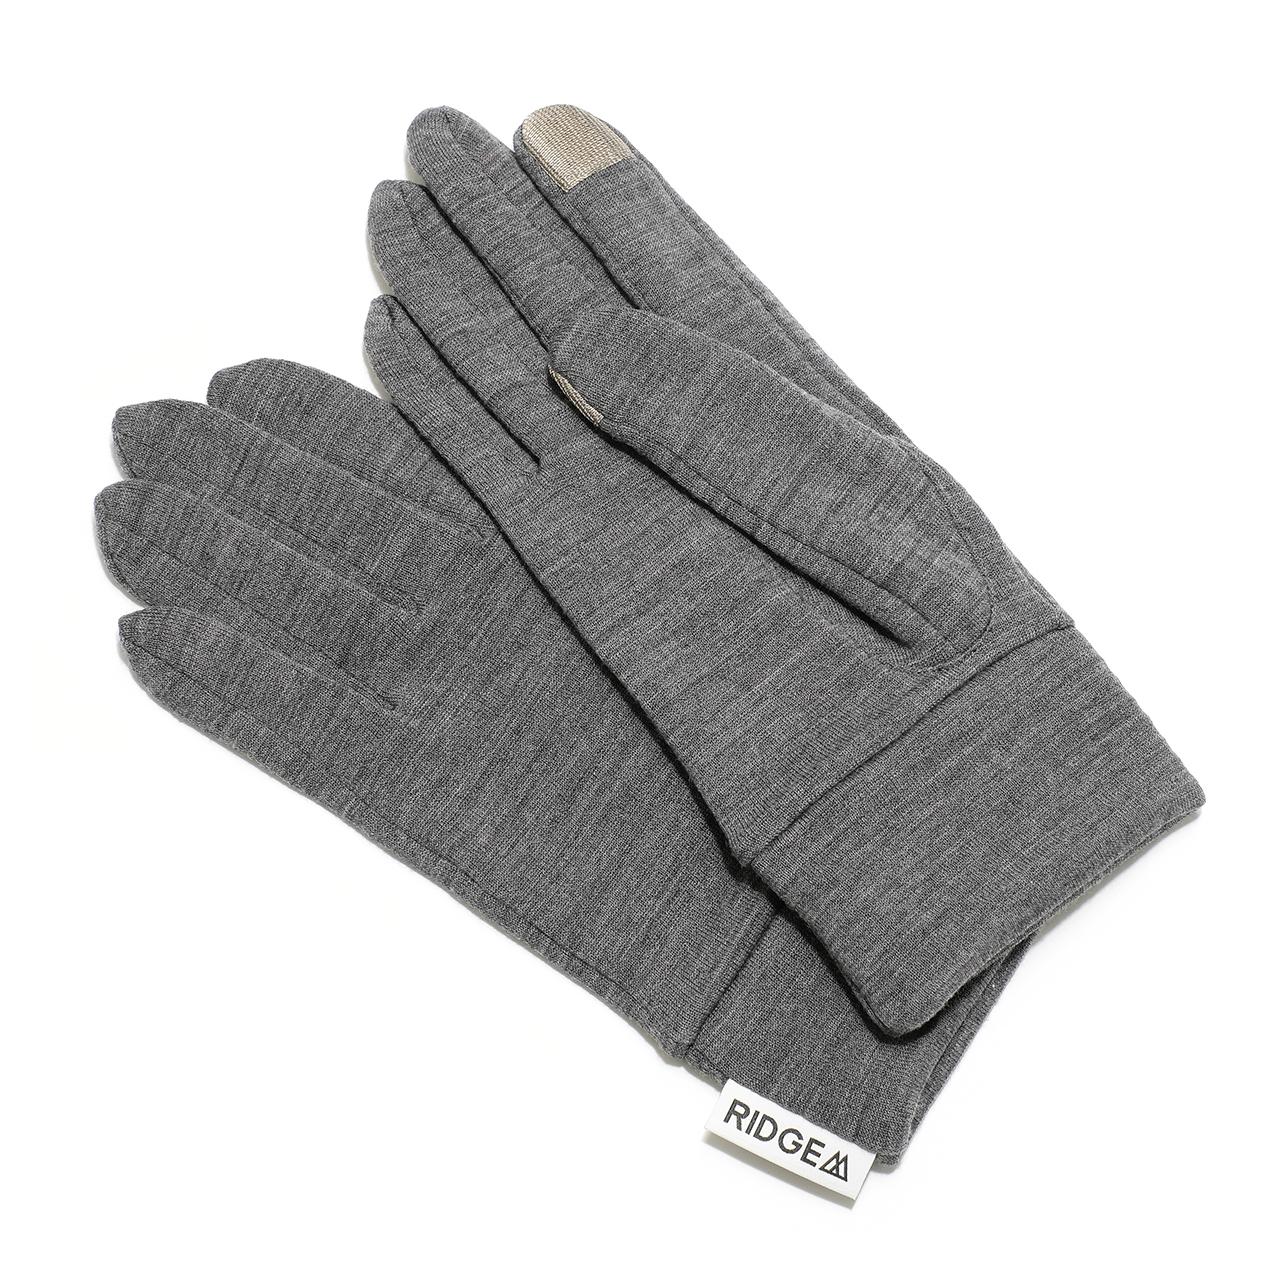 Grid Merino Glove(開発中)